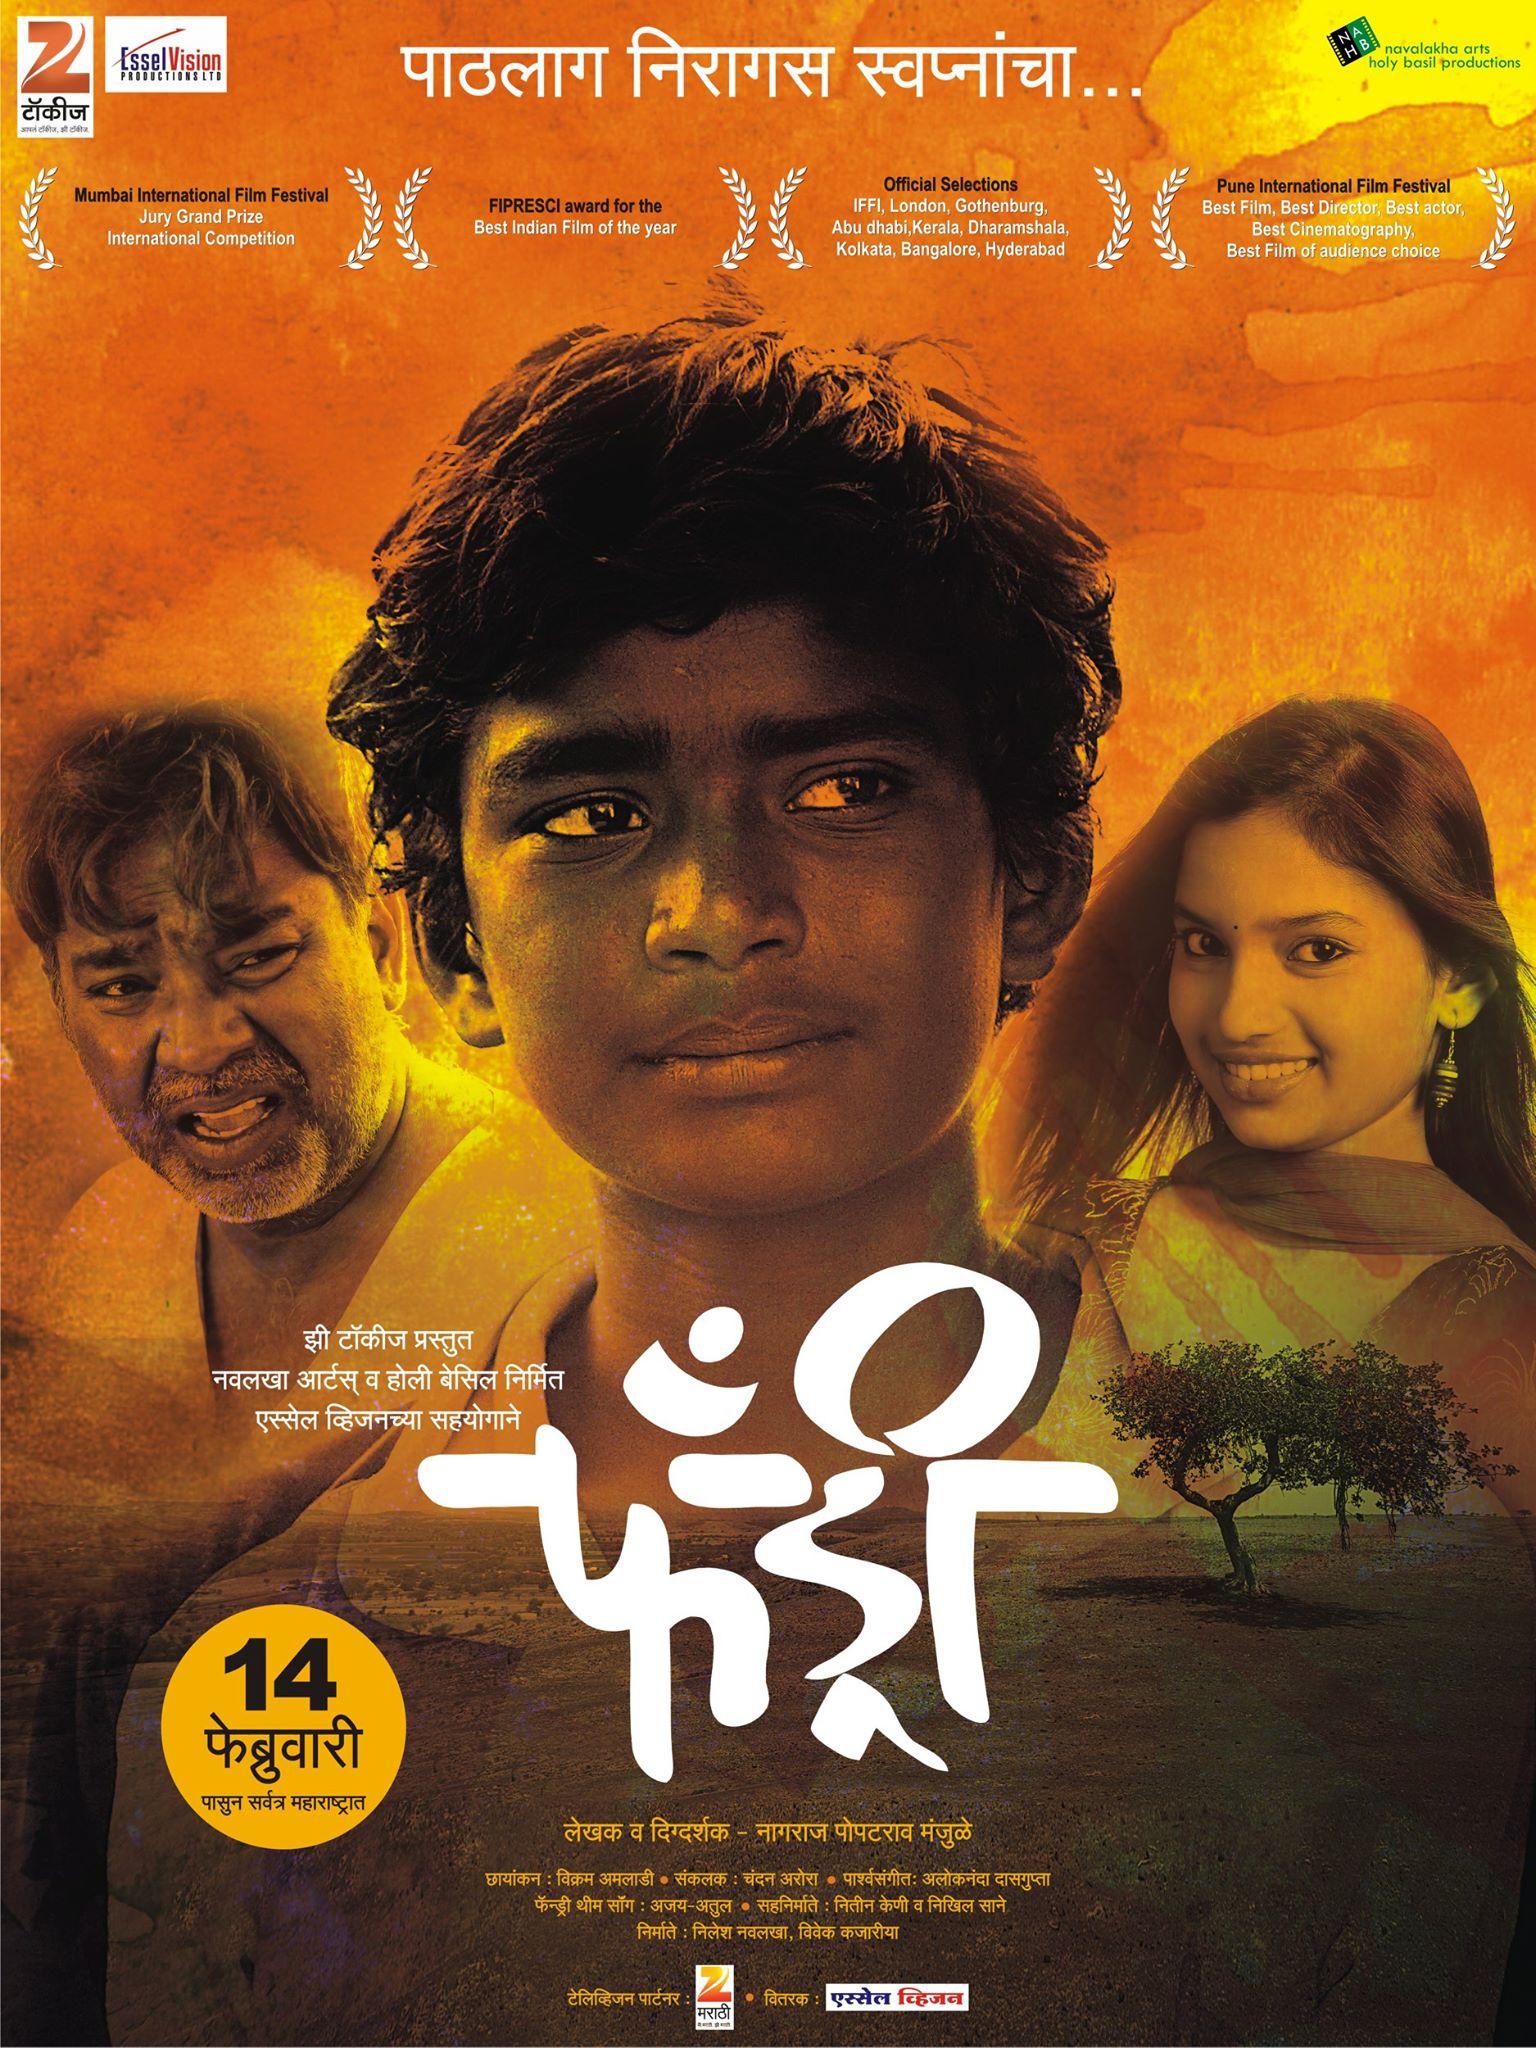 Pankaj gangar aplimumbai: Fandry Marathi movie Cast, story, Photos